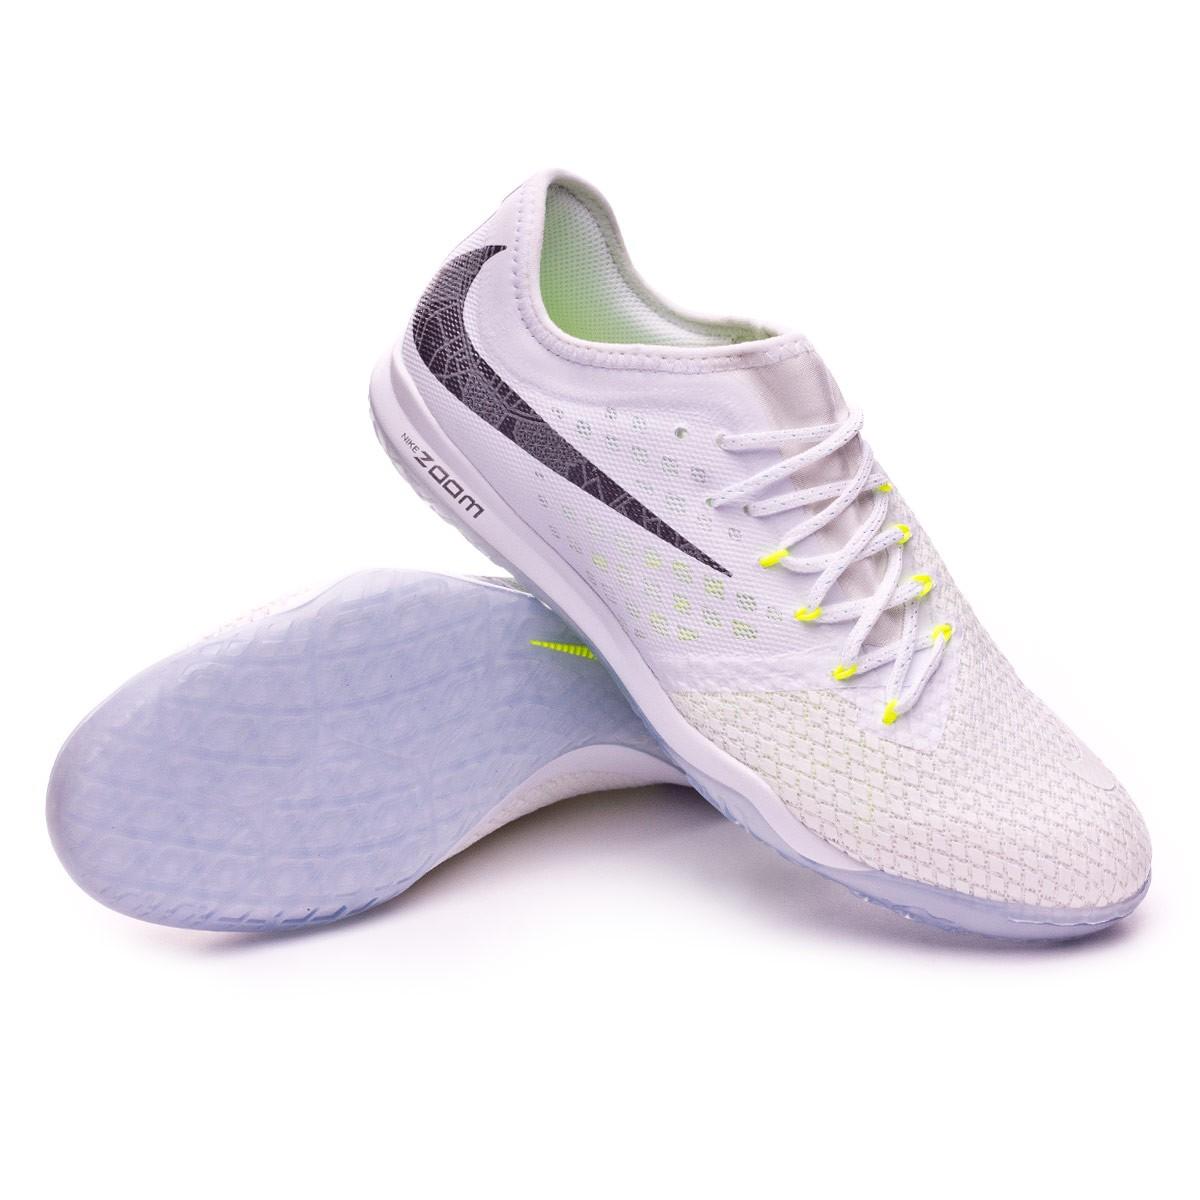 c3e3bcc5ce0a Futsal Boot Nike Hypervenom Zoom PhantomX III Pro IC White-Metallic cool  grey-Volt-Mtallic cool gr - Football store Fútbol Emotion